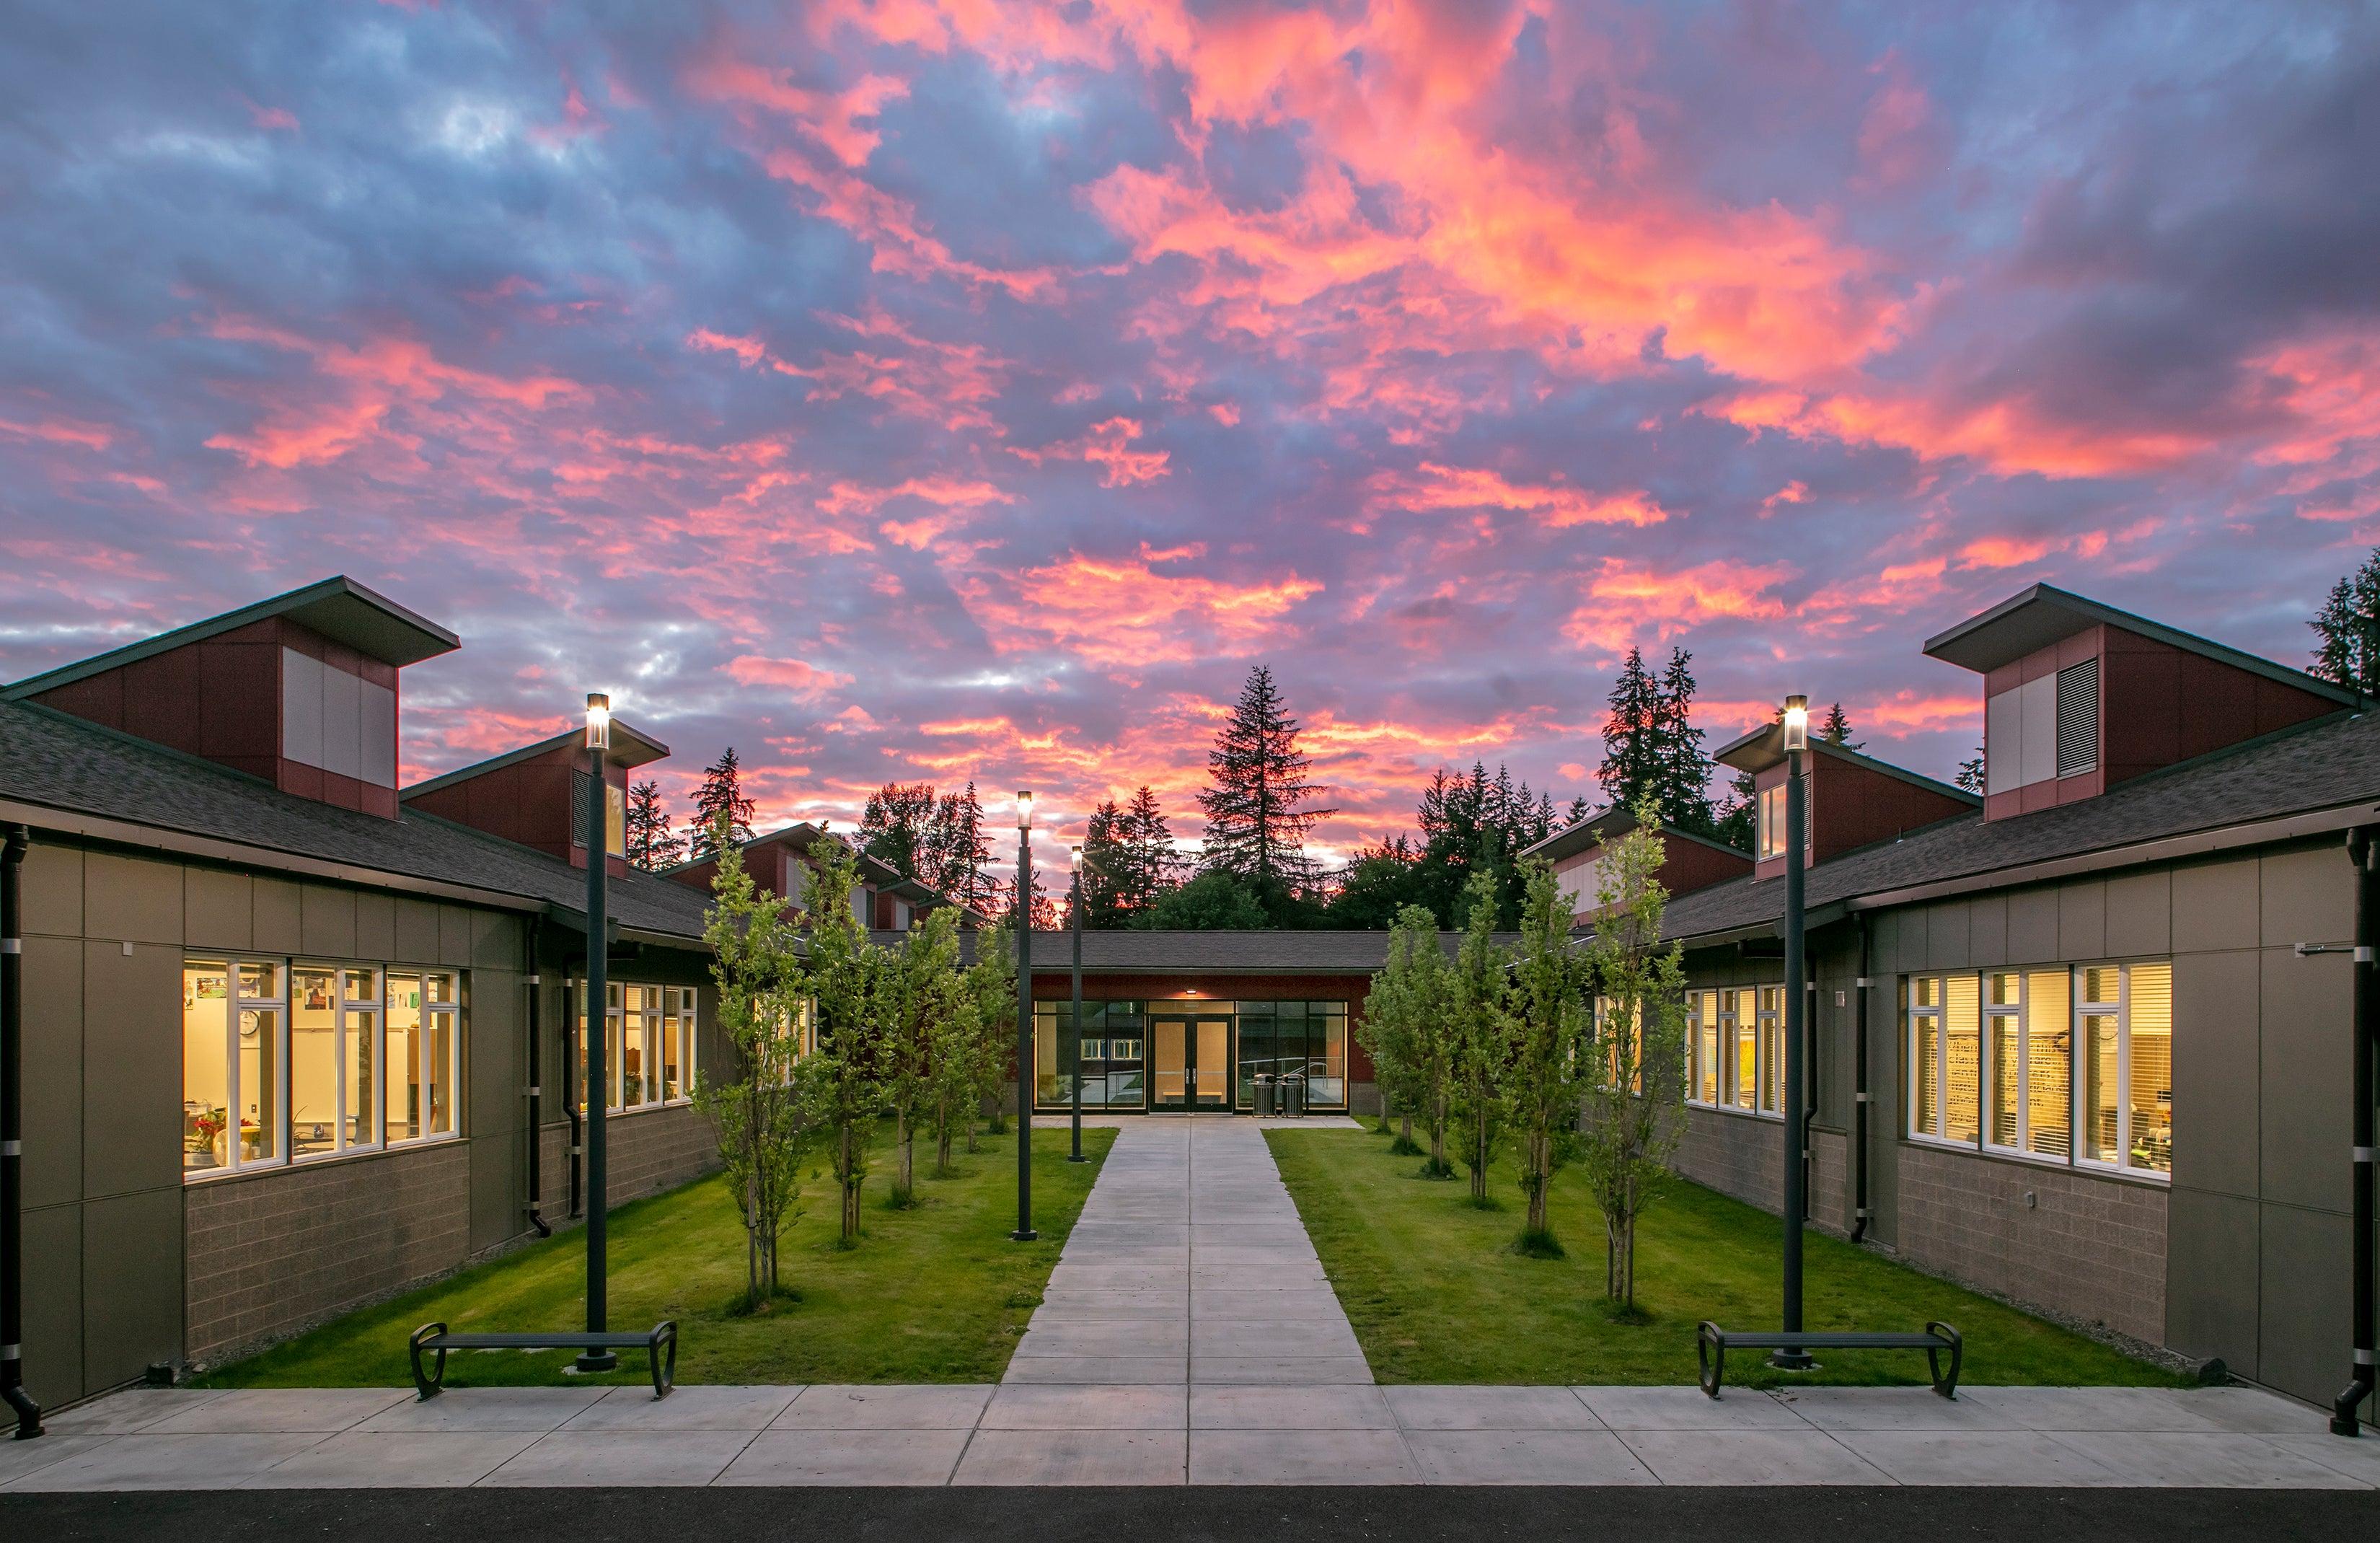 Littlerock Elementary School - TCF Architecture